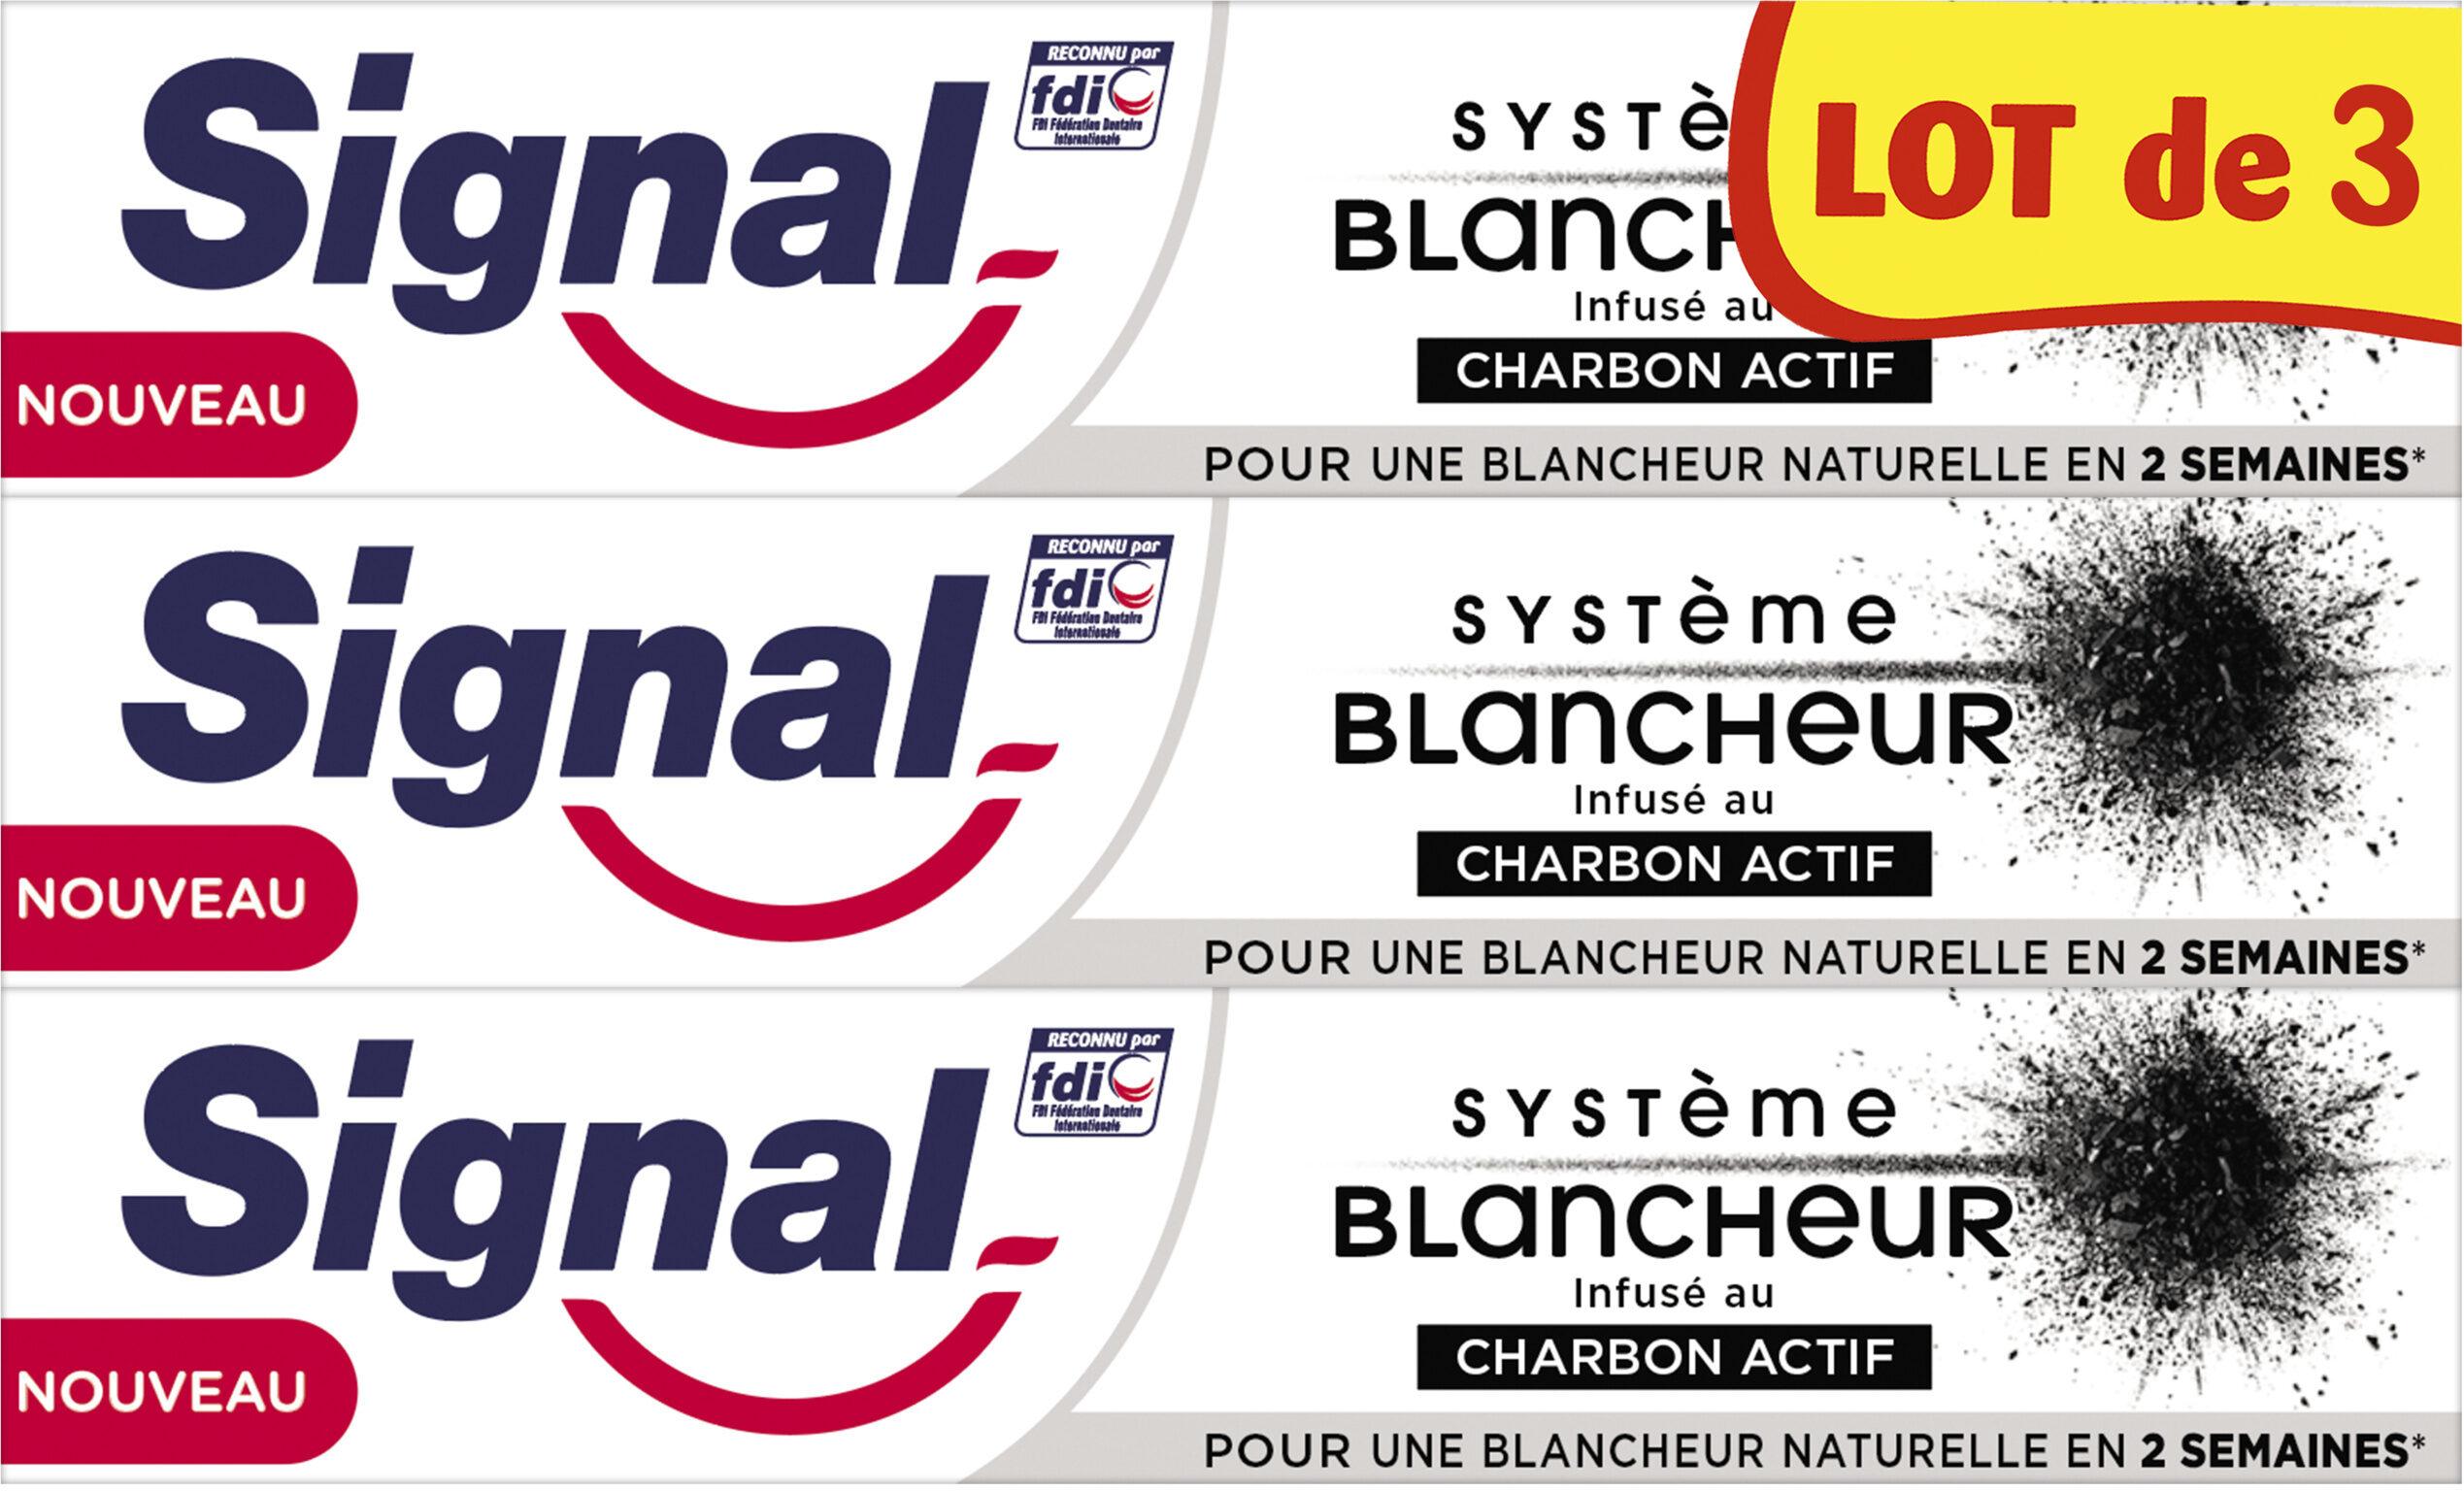 Signal Dentifrice Système Blancheur Charbon Actif 3x75ml - Produto - fr